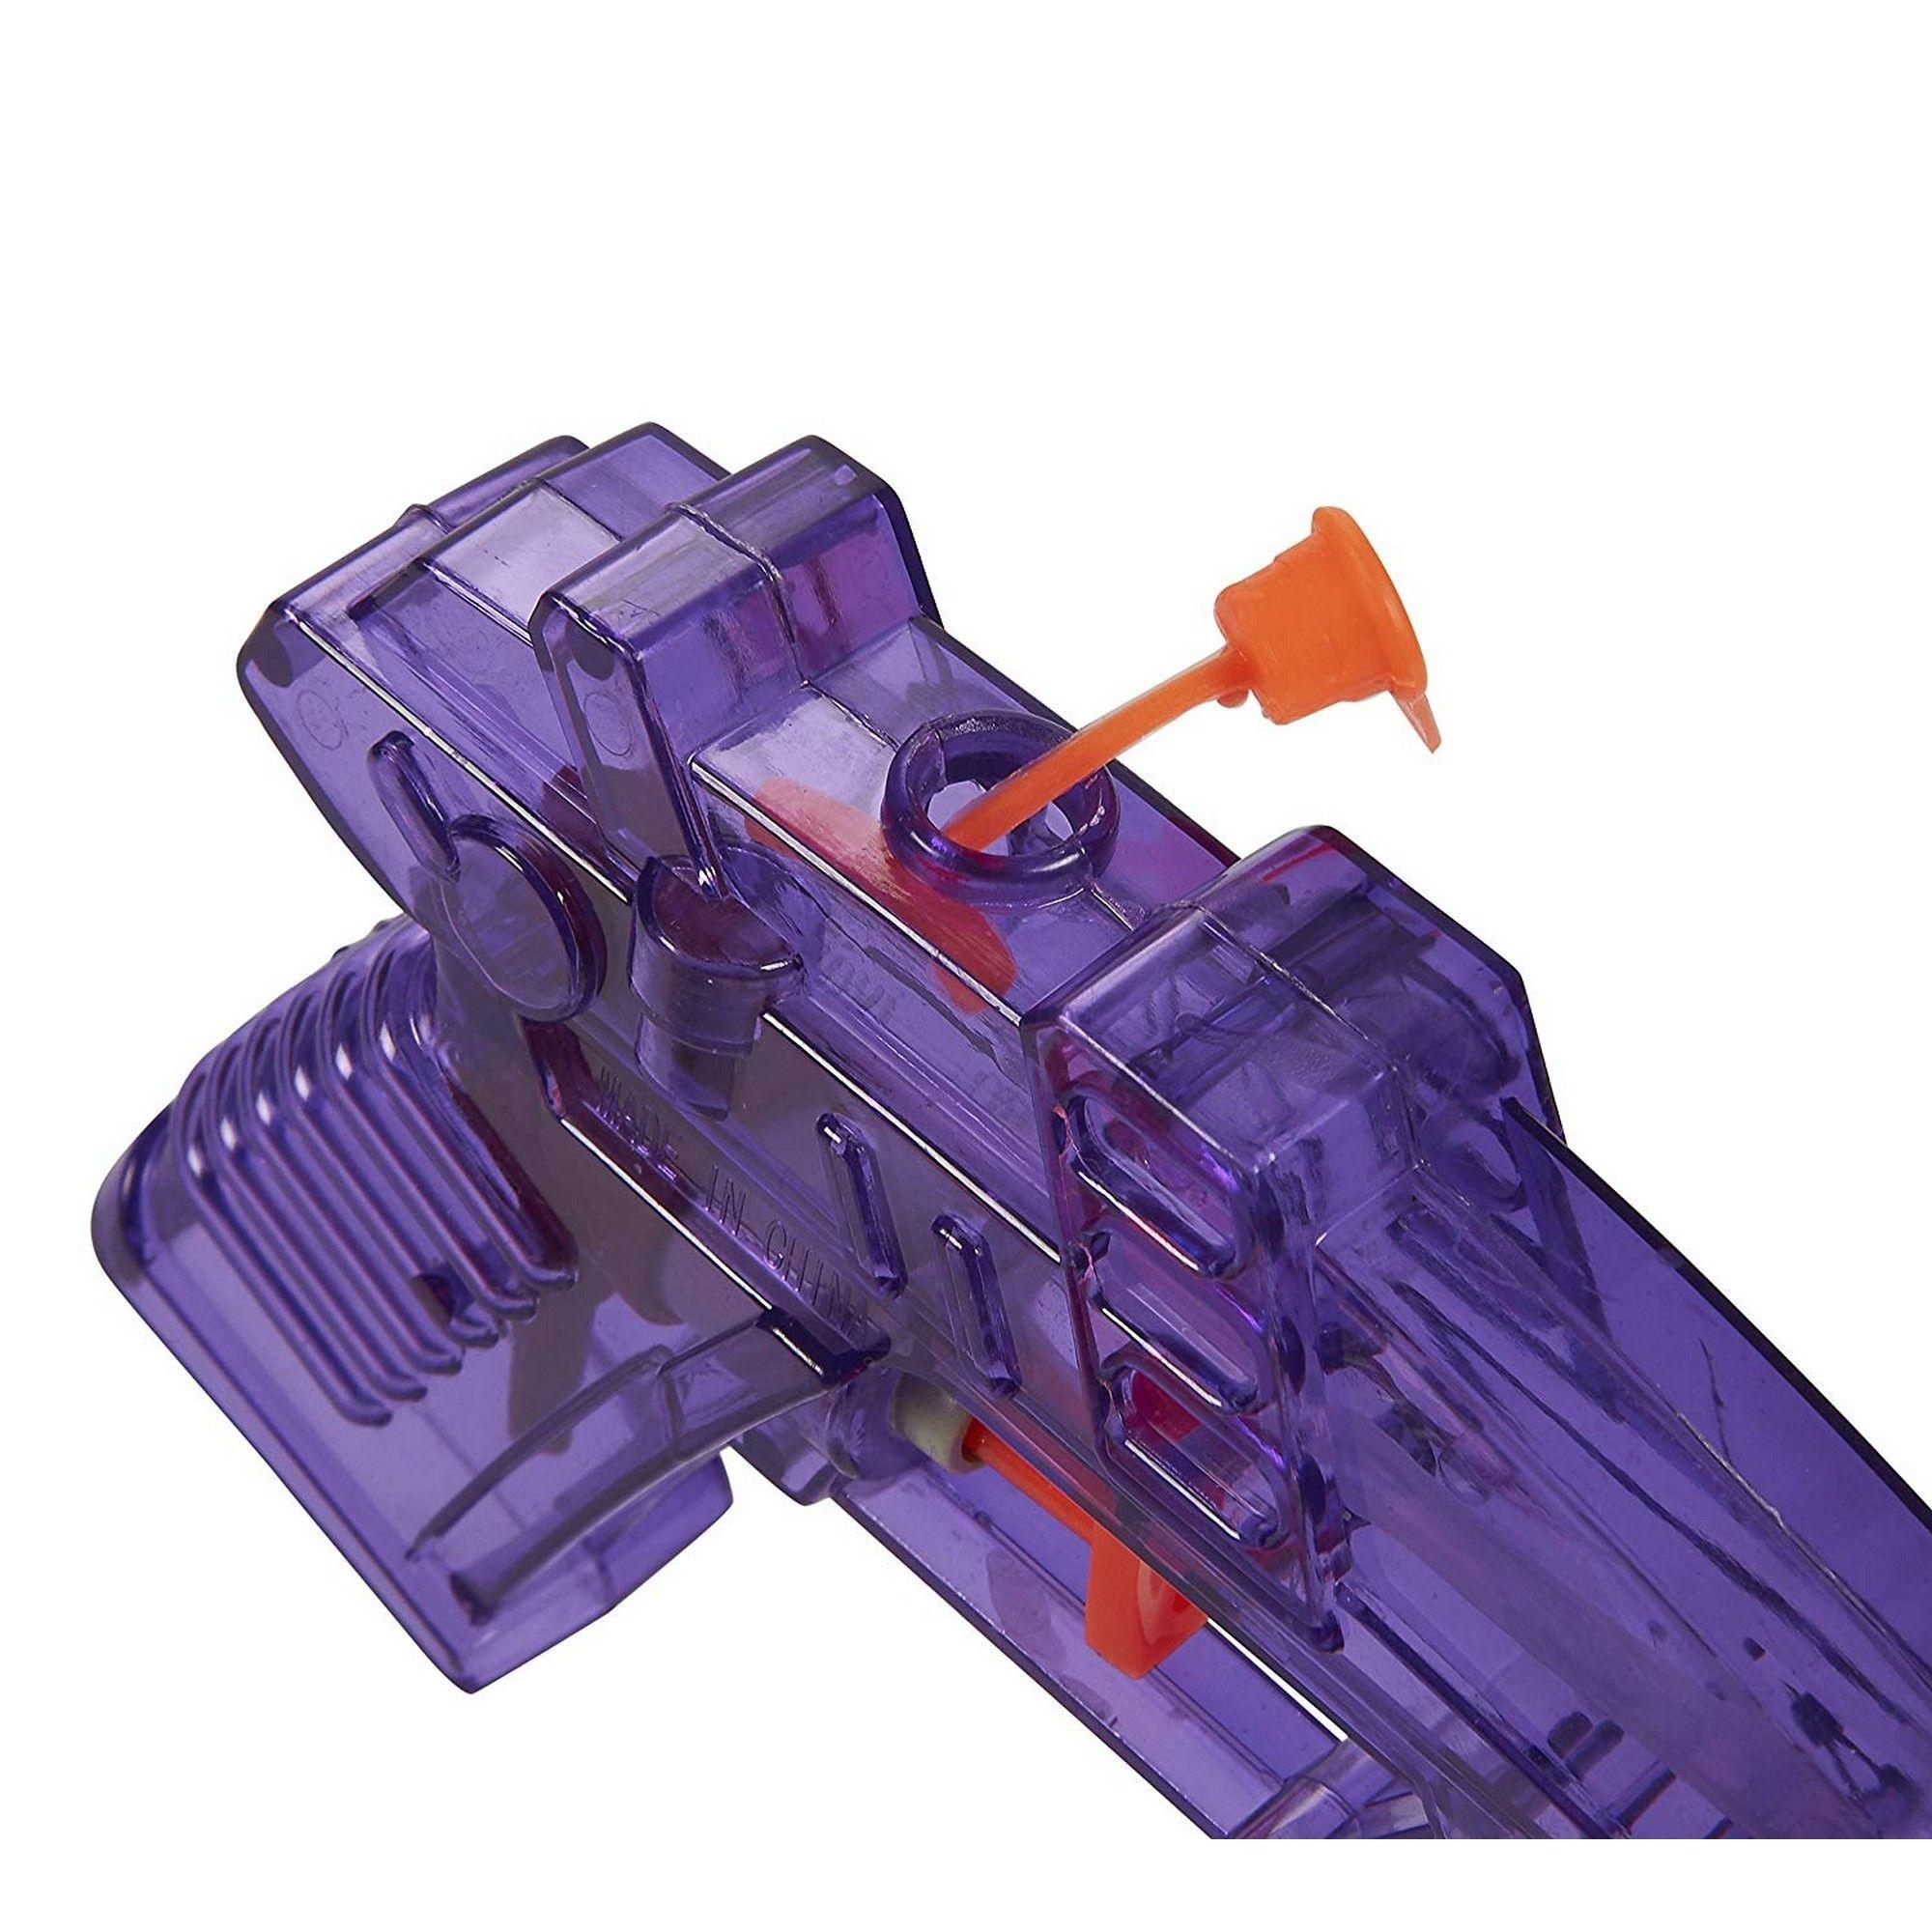 Warenfux24 Wasserpistole Transparent 13 cm Revolver orange pink 3er Pack gr/ün